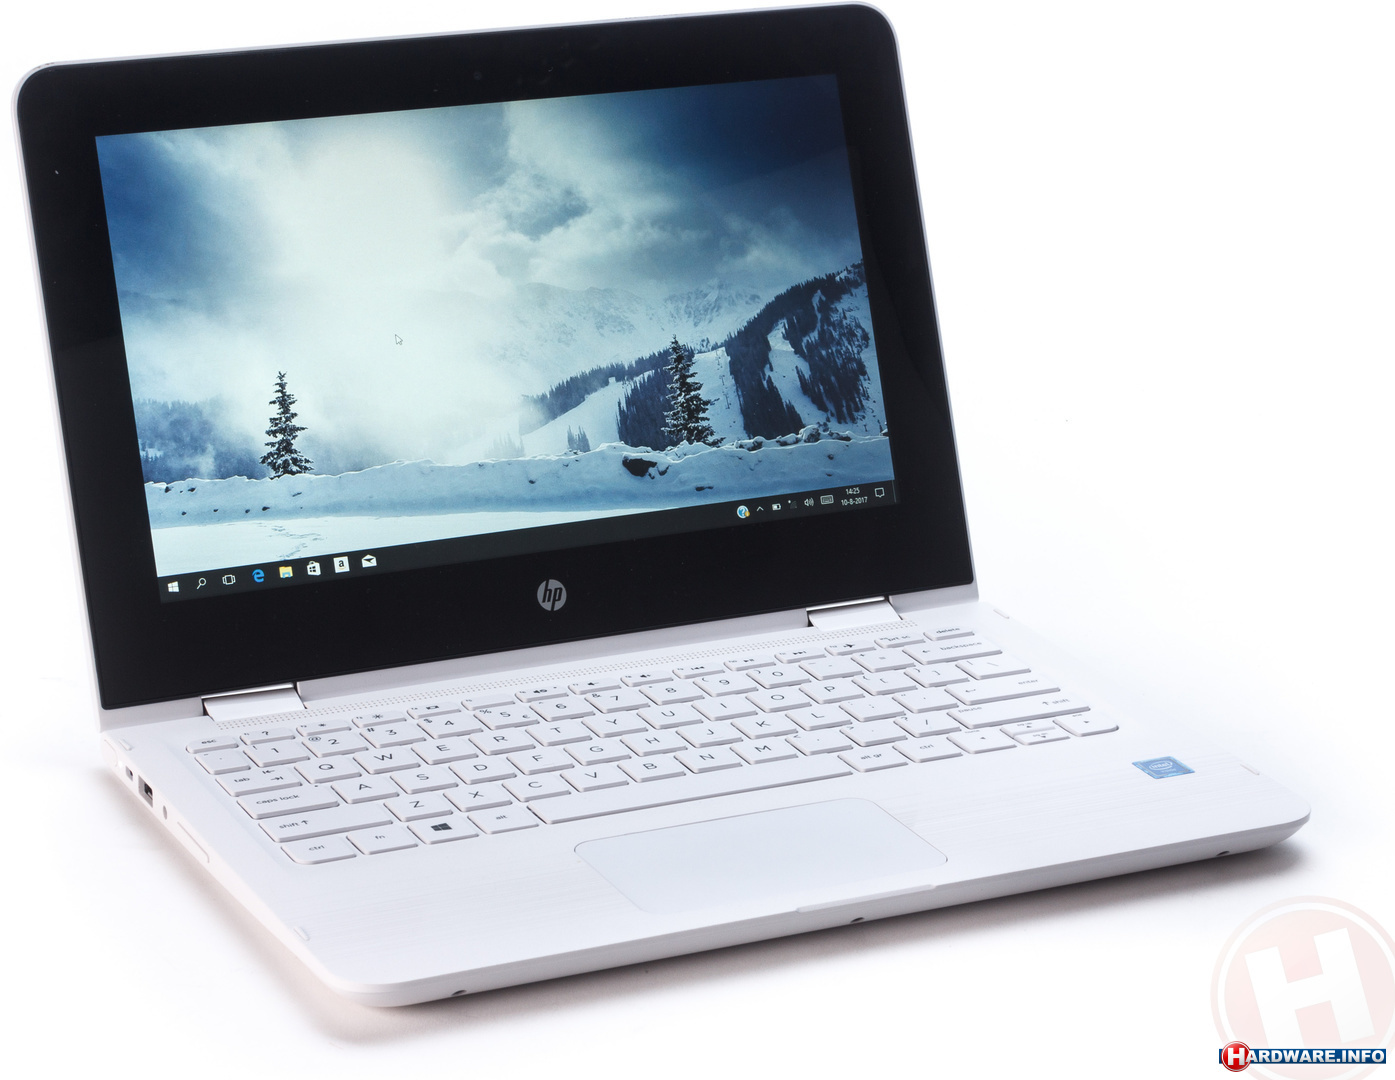 HP Stream 11-aa010nd x360 (Z3F48EA) laptop/tablet - Hardware